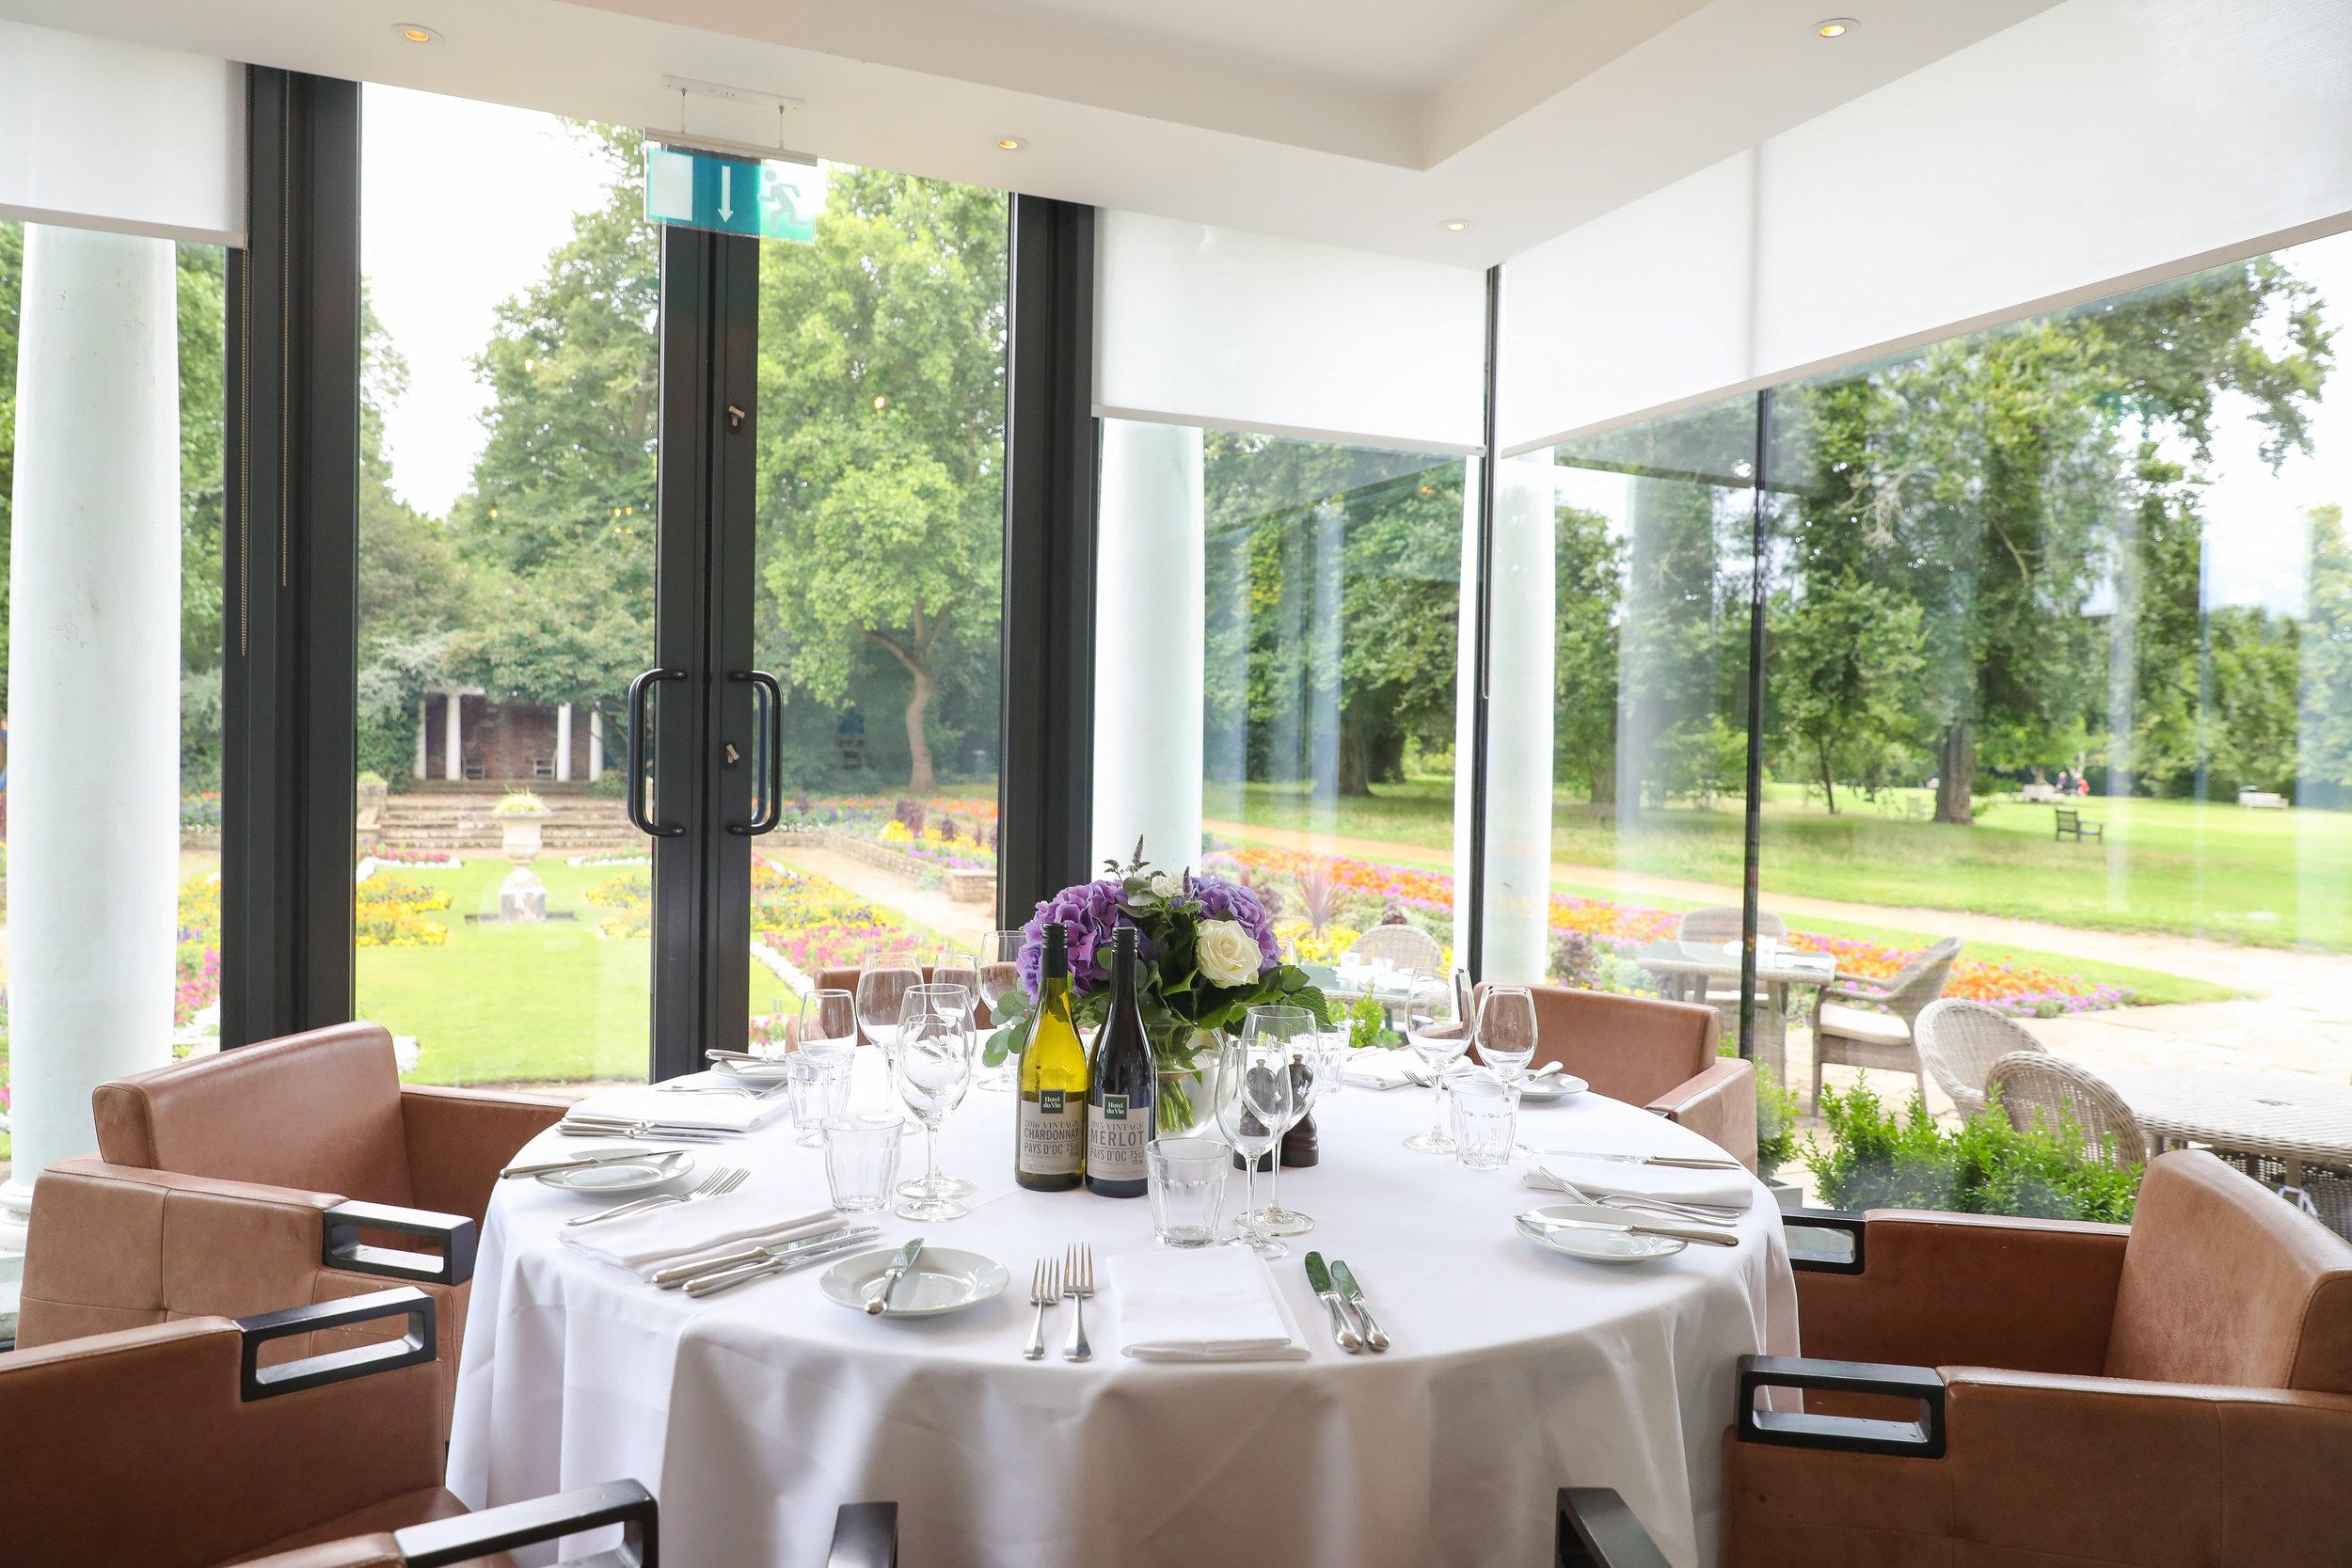 Wimbledon tennis cannizaro house lunch hospitality